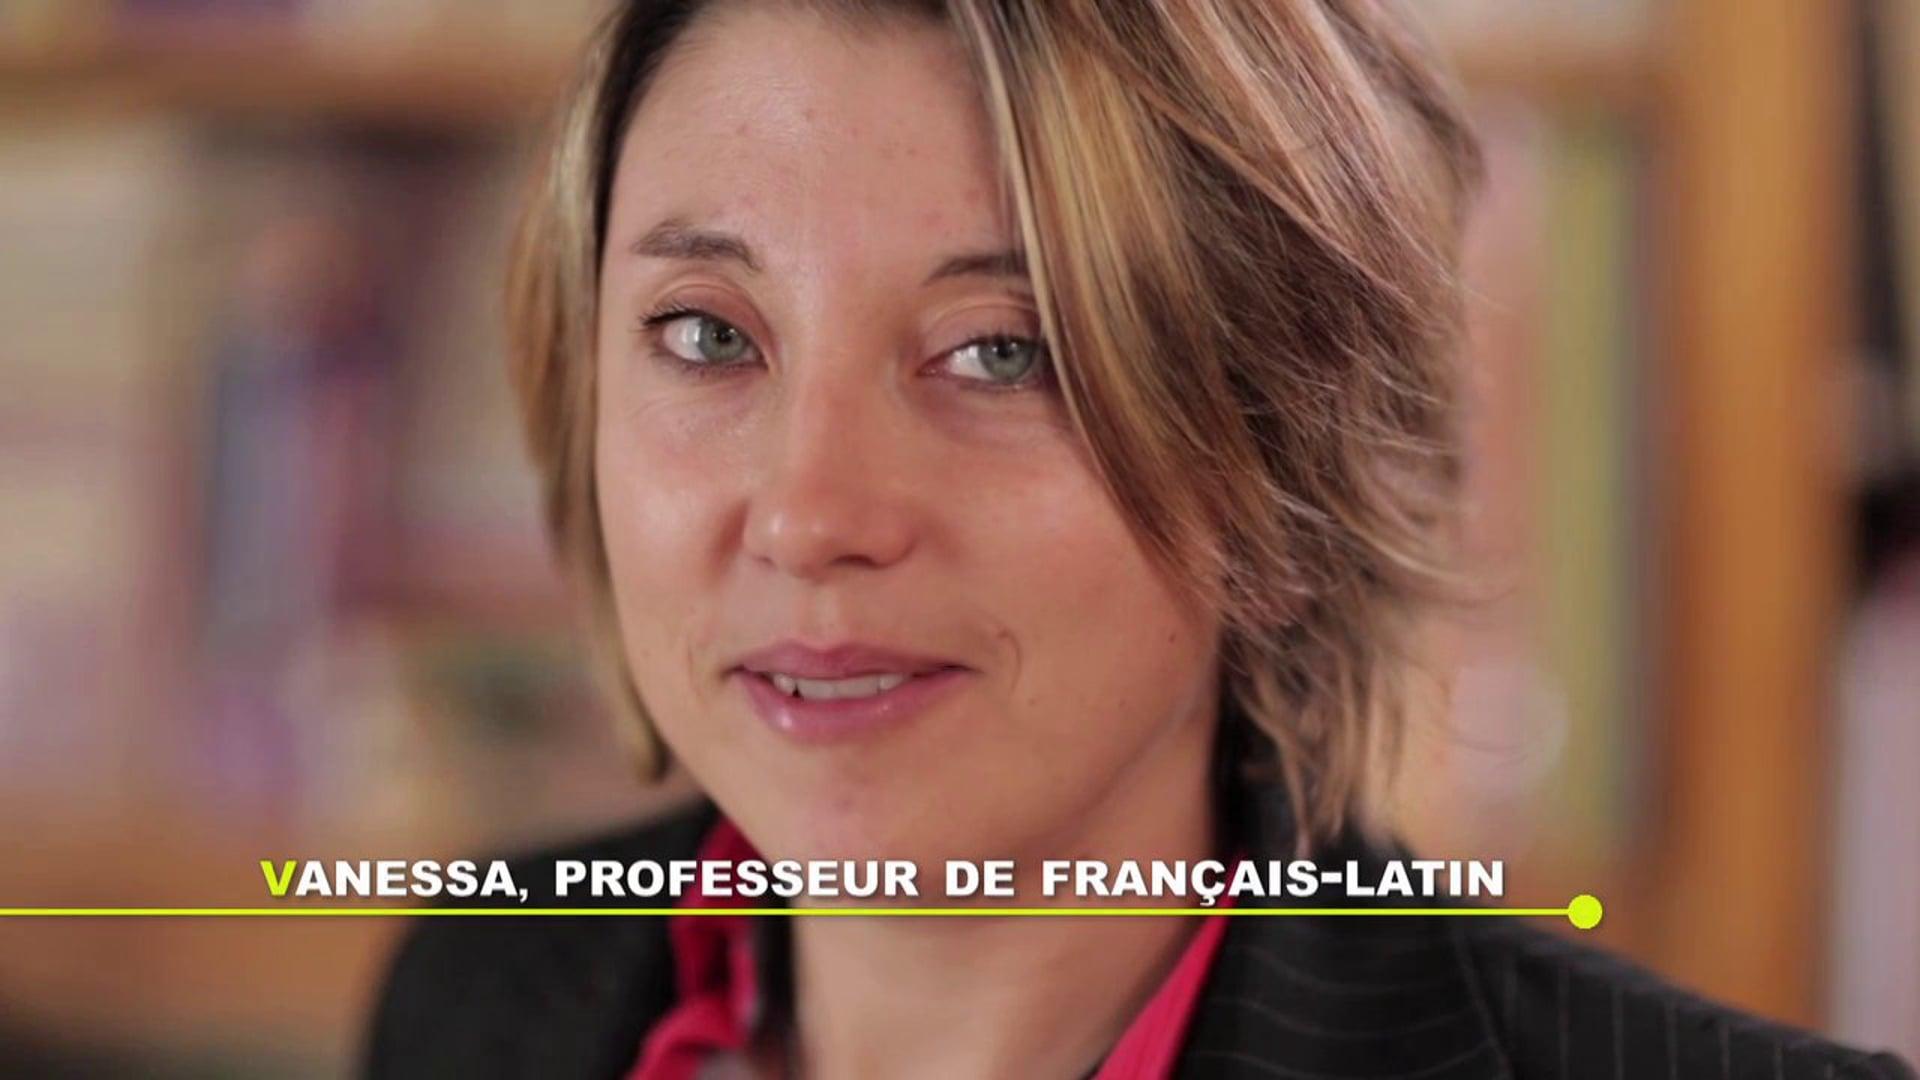 Devenir Enseignant - Vanessa